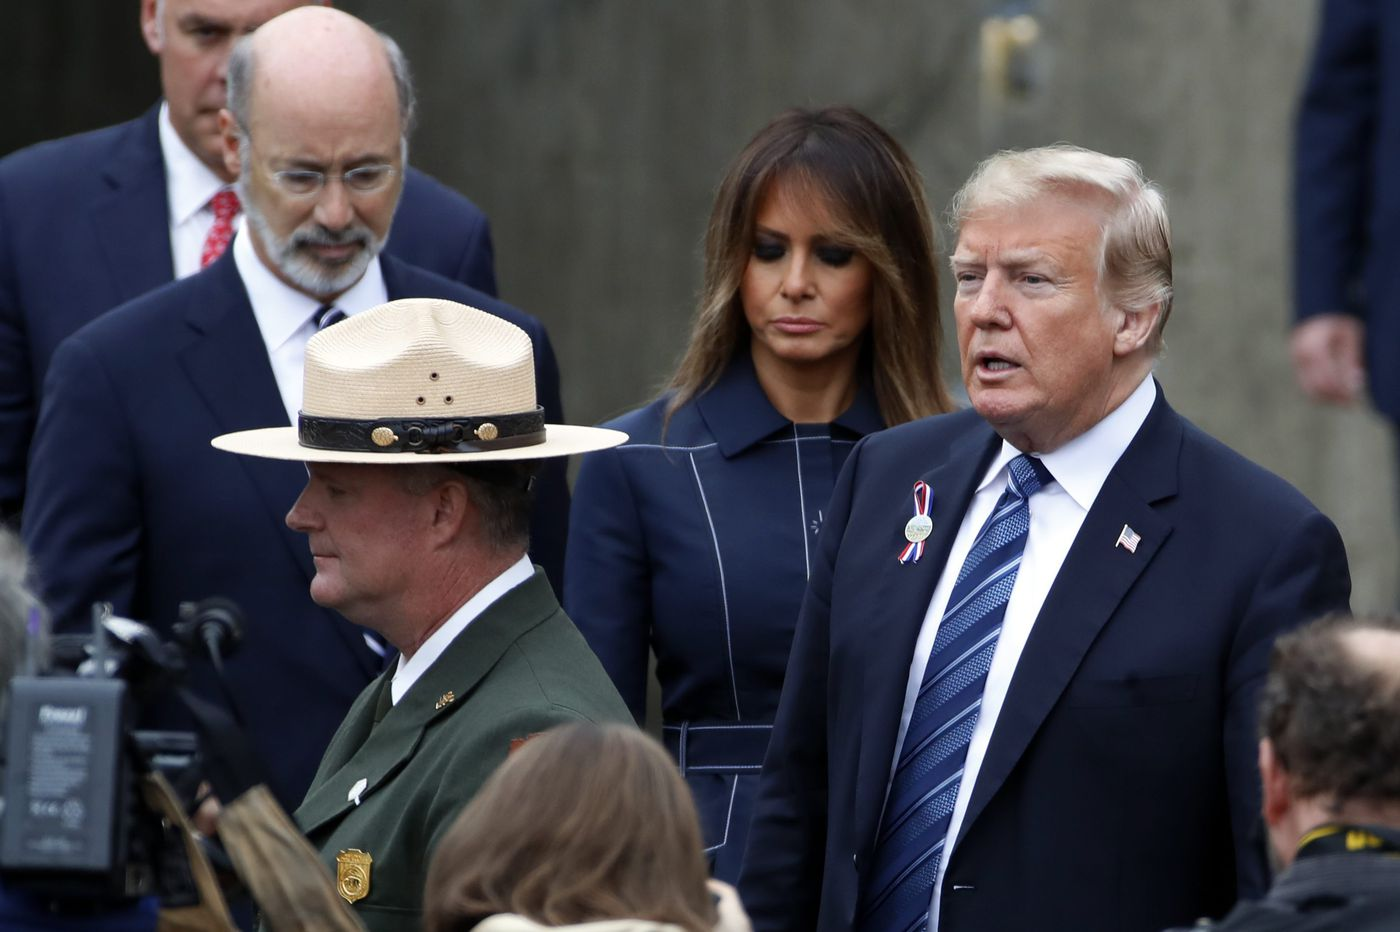 Trump visits Flight 93 memorial on 9/11: 'They entered eternity as heroes'